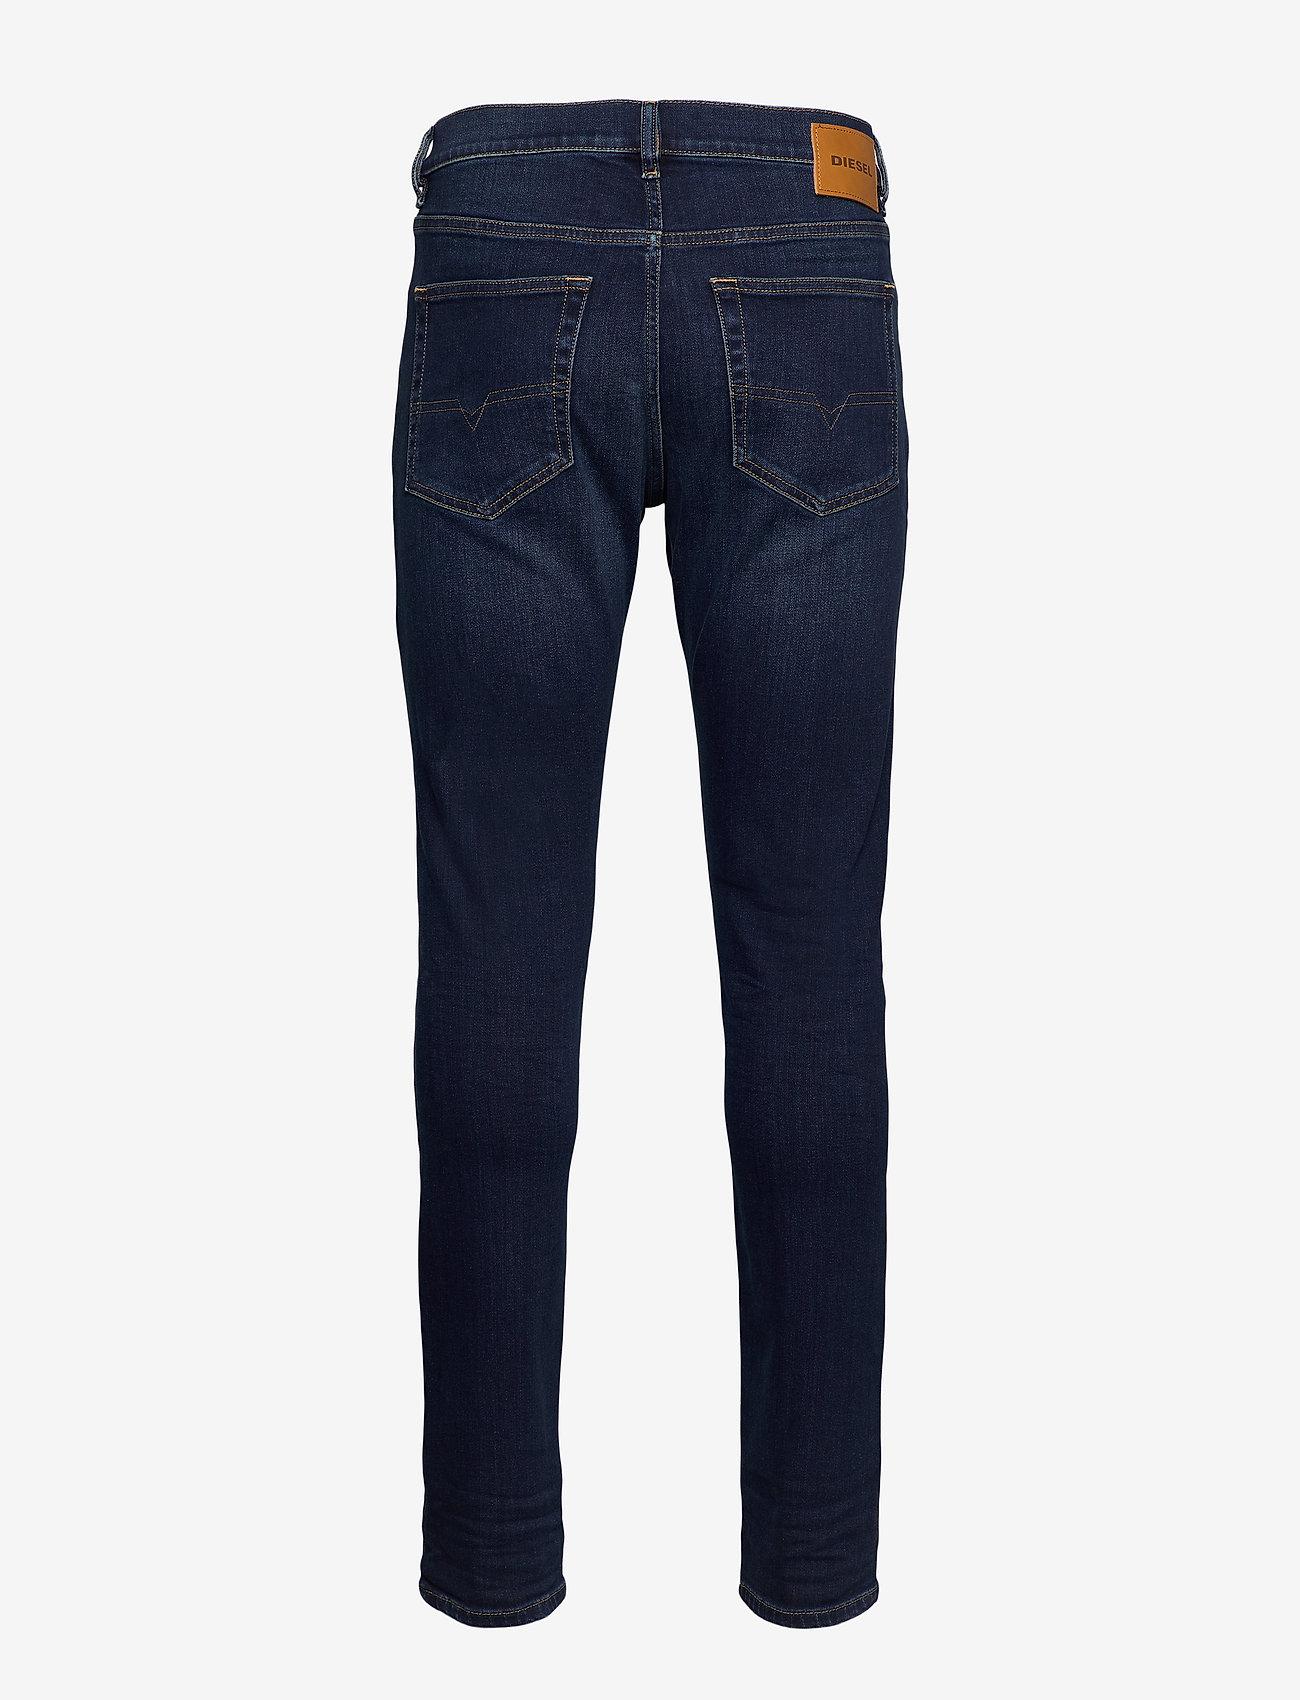 Diesel Men - D-LUSTER L.32 TROUSERS - slim jeans - denim - 1